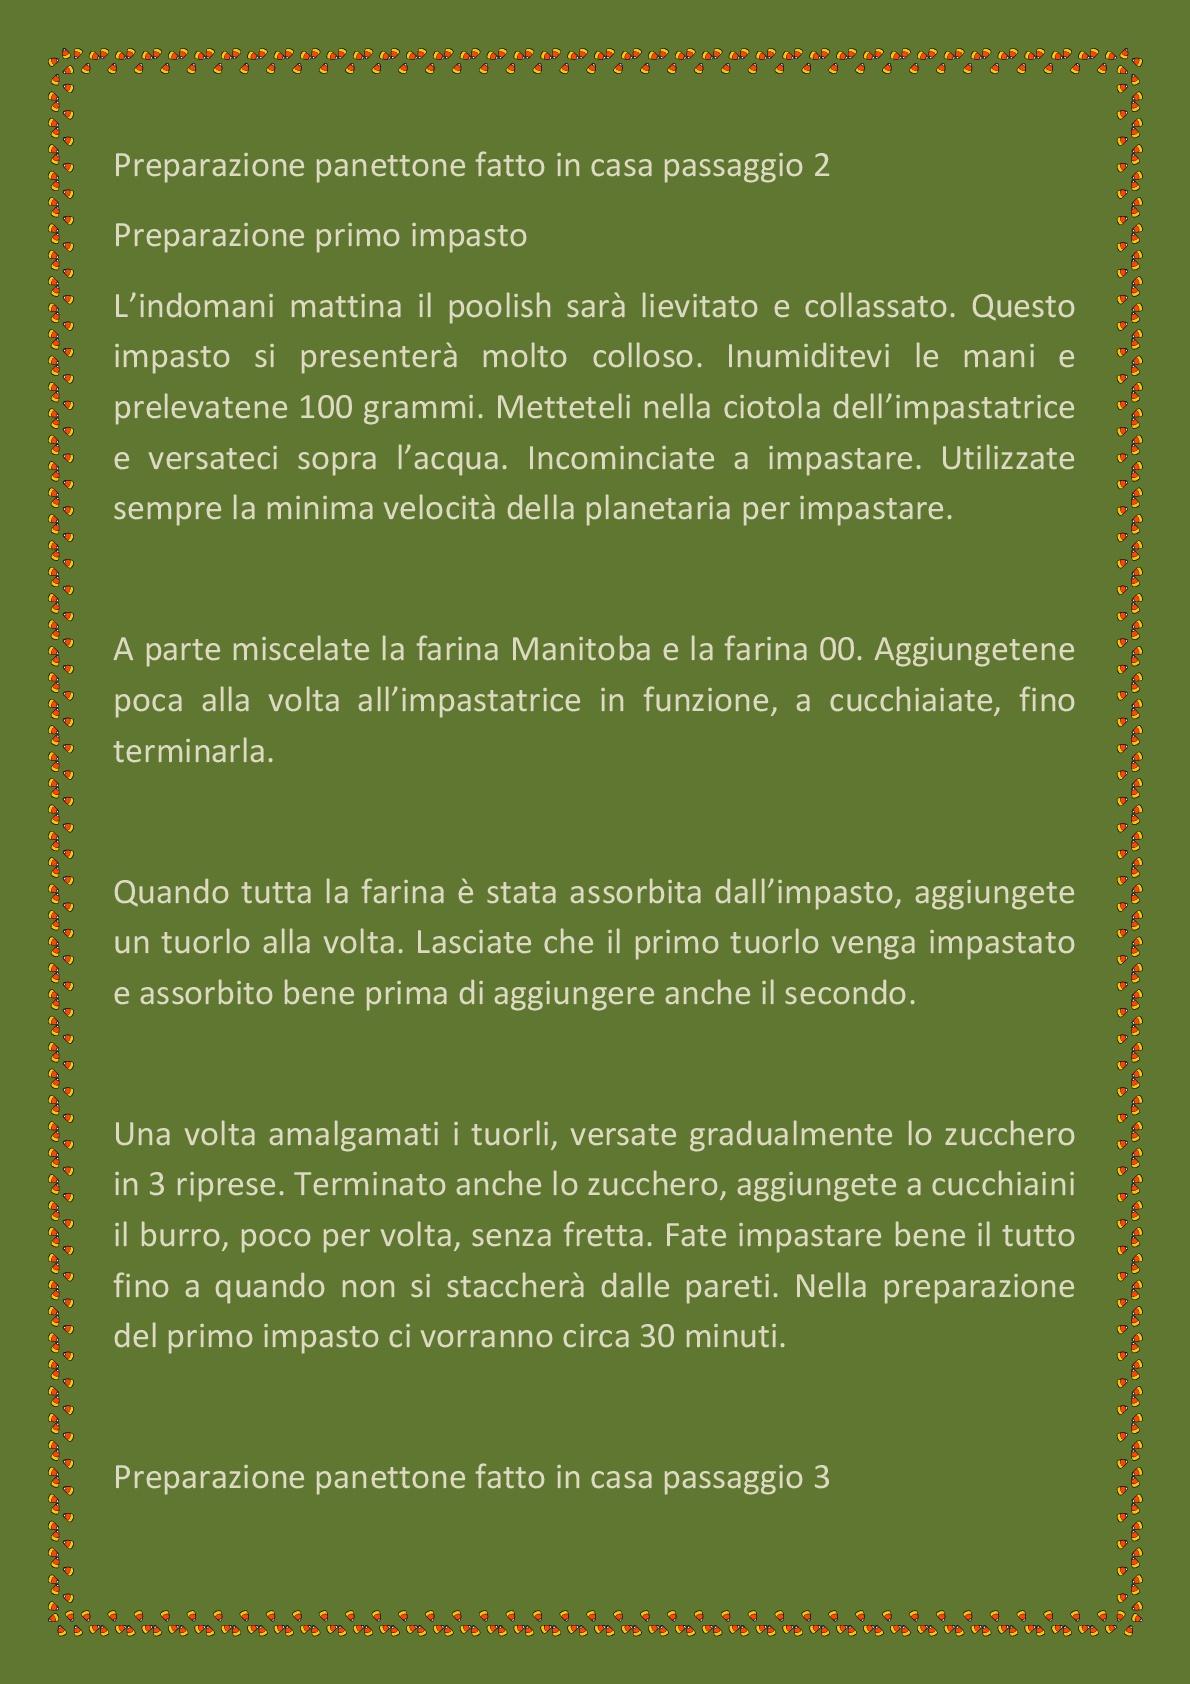 IL-RICETTARIO-(1)-004